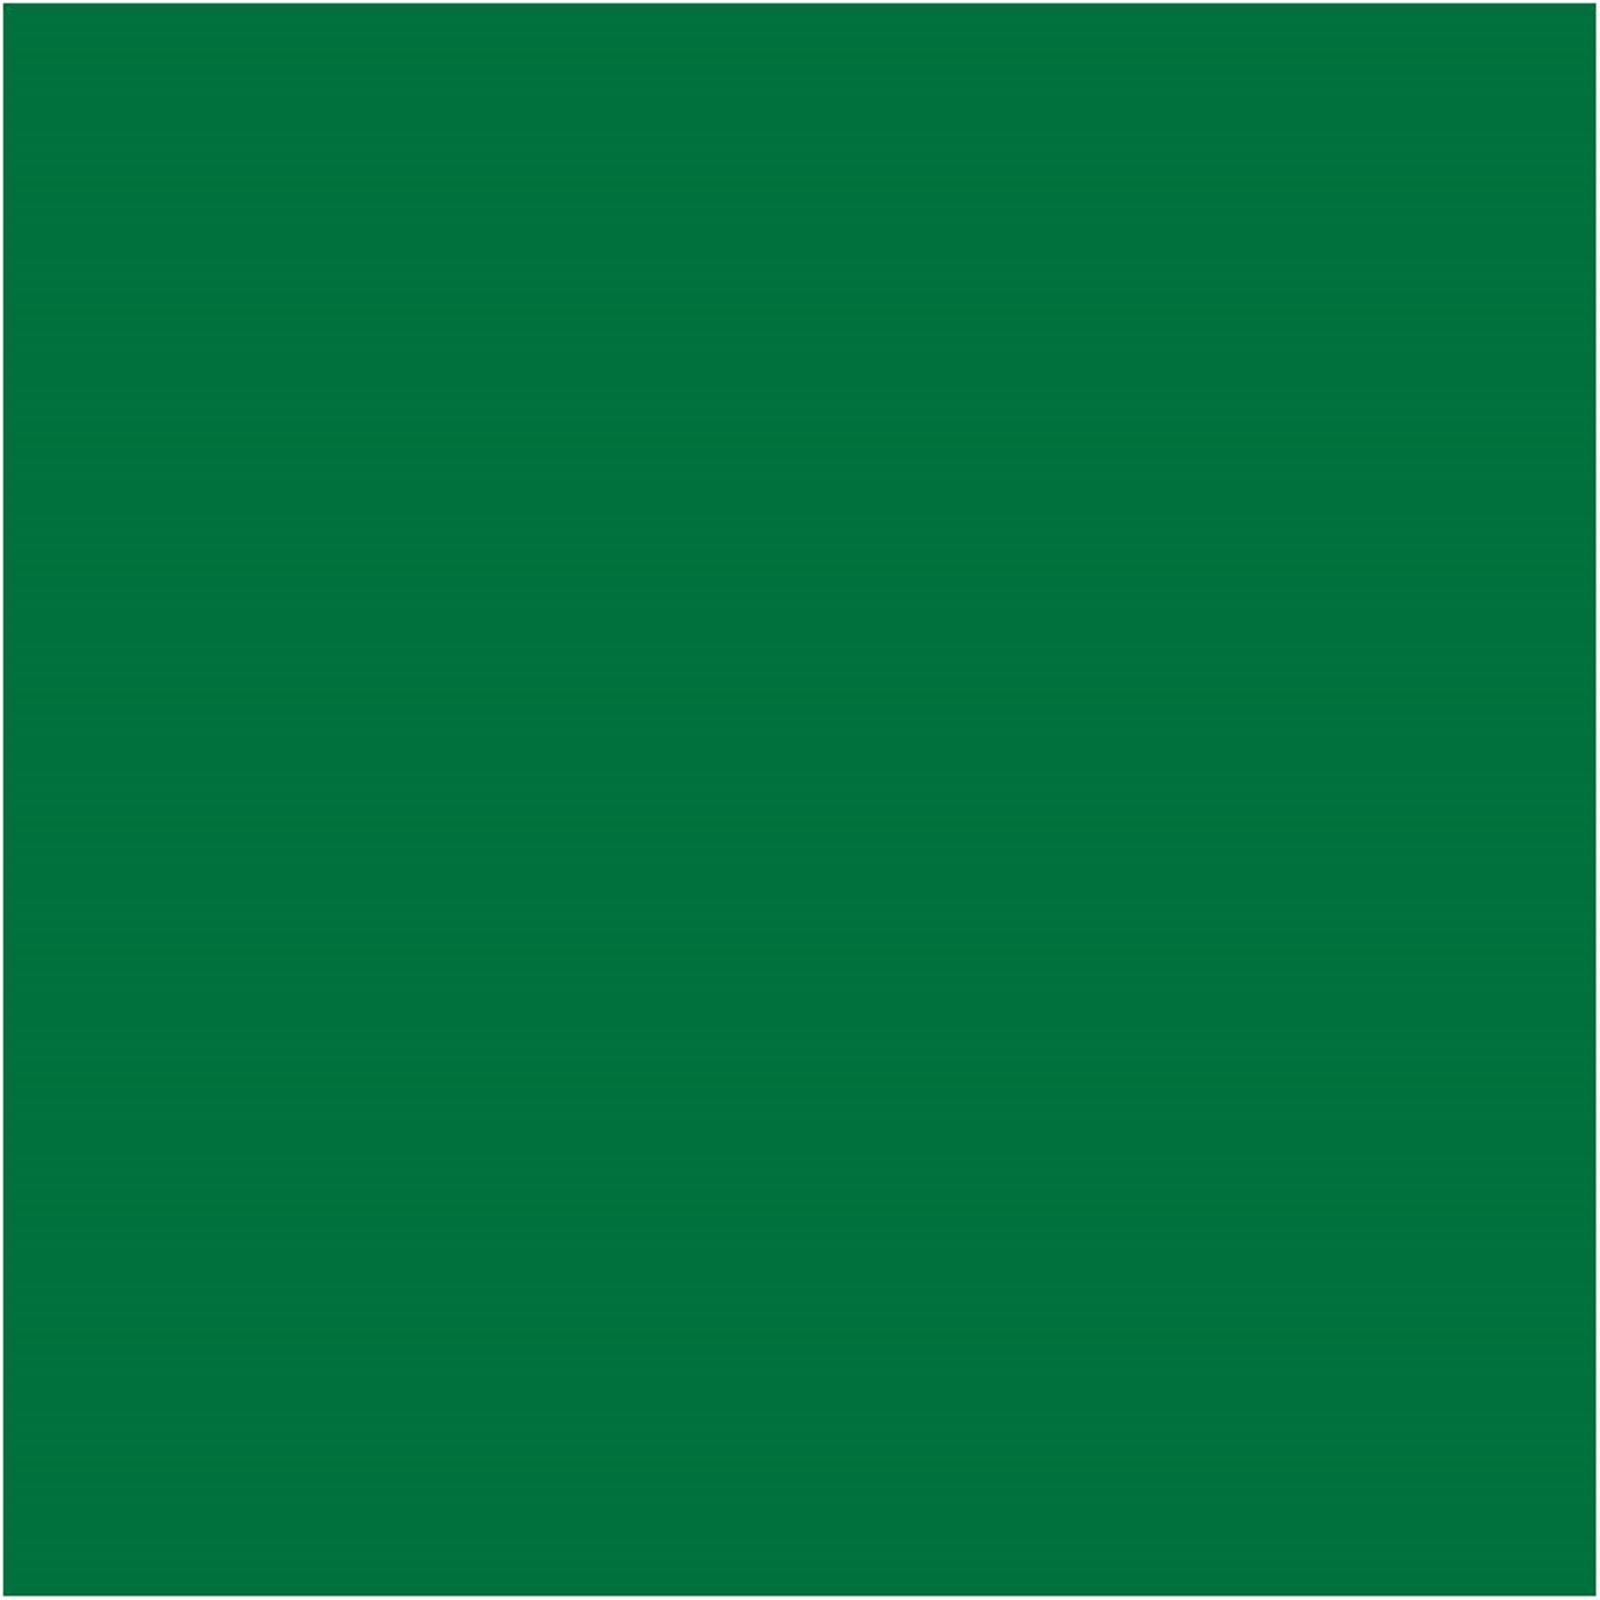 verde creamy